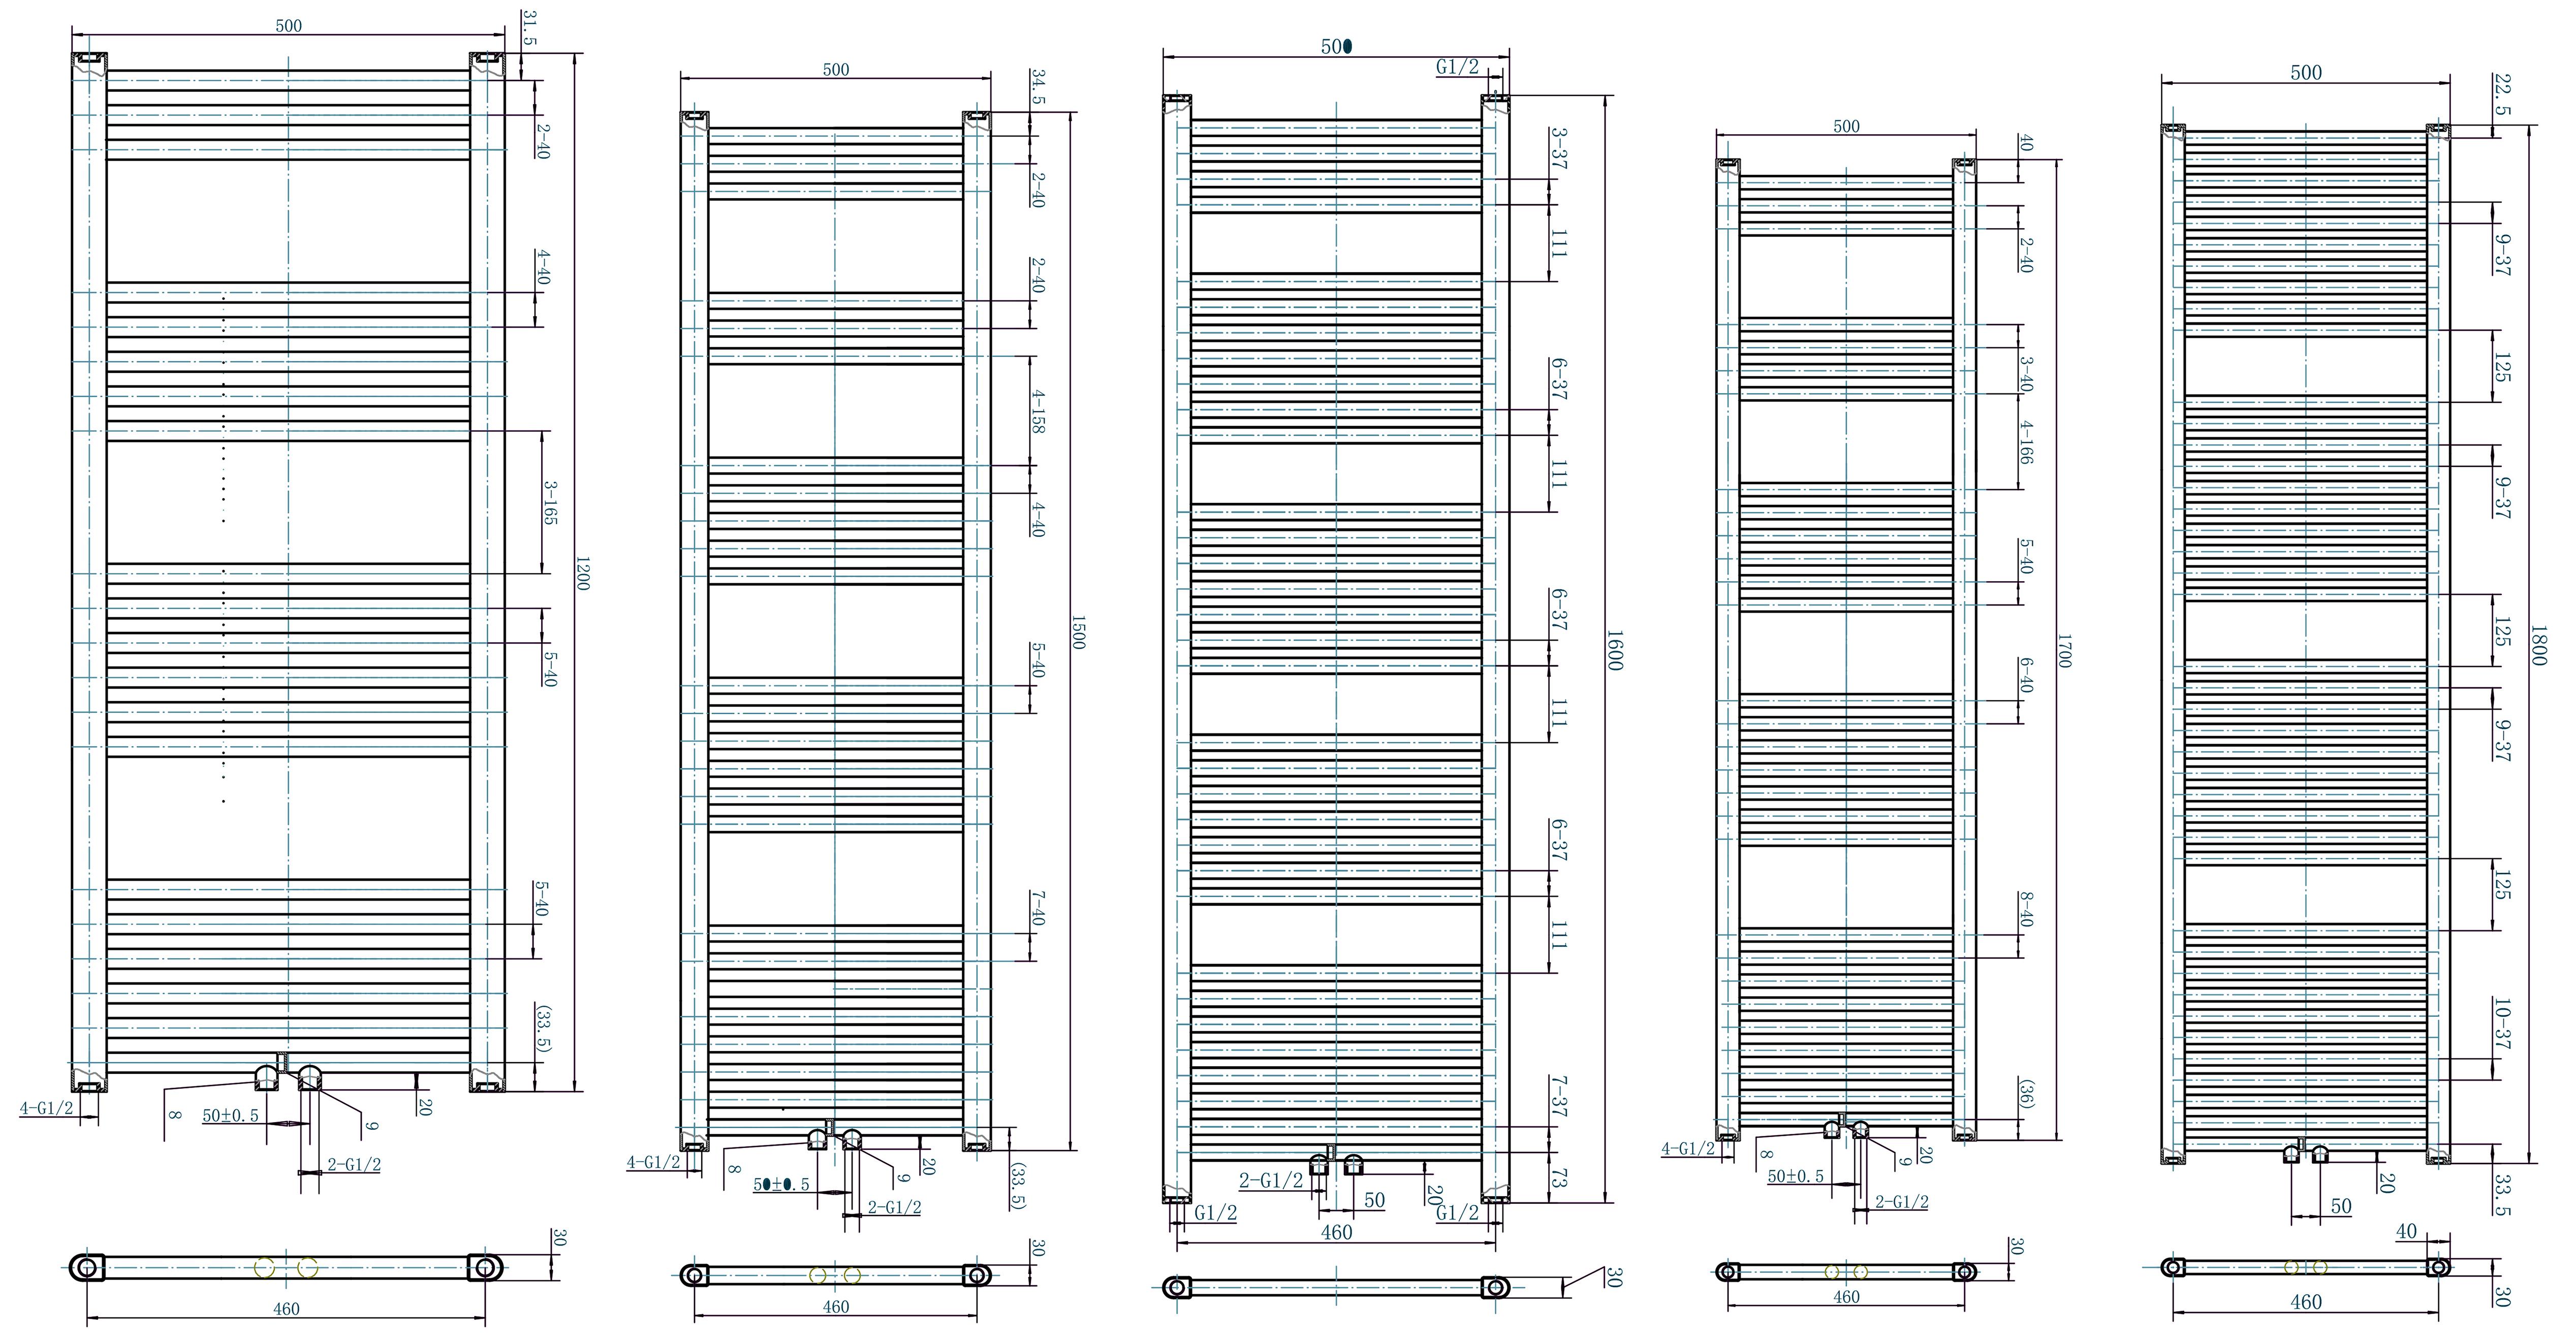 Badheizkörper R18W-A 500mm - Zeichnung